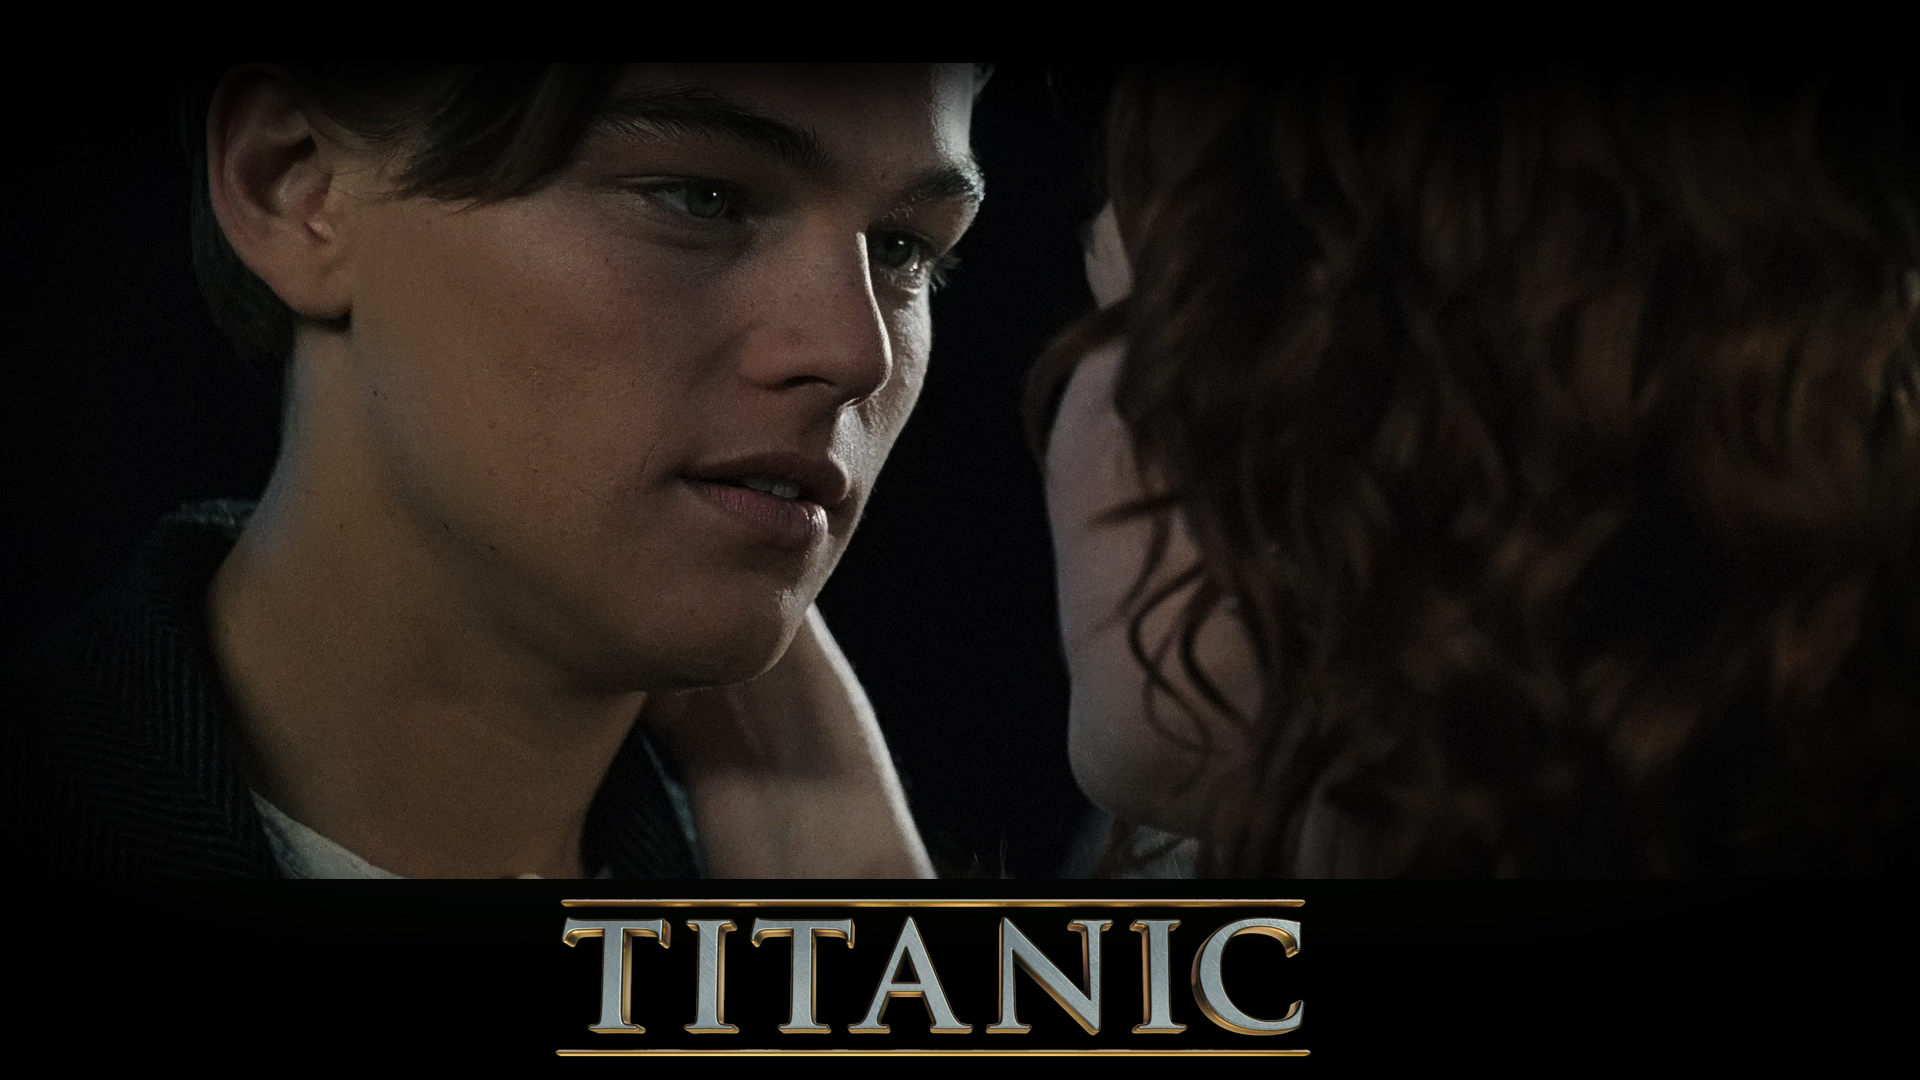 Titanic 3D wallpaper 7